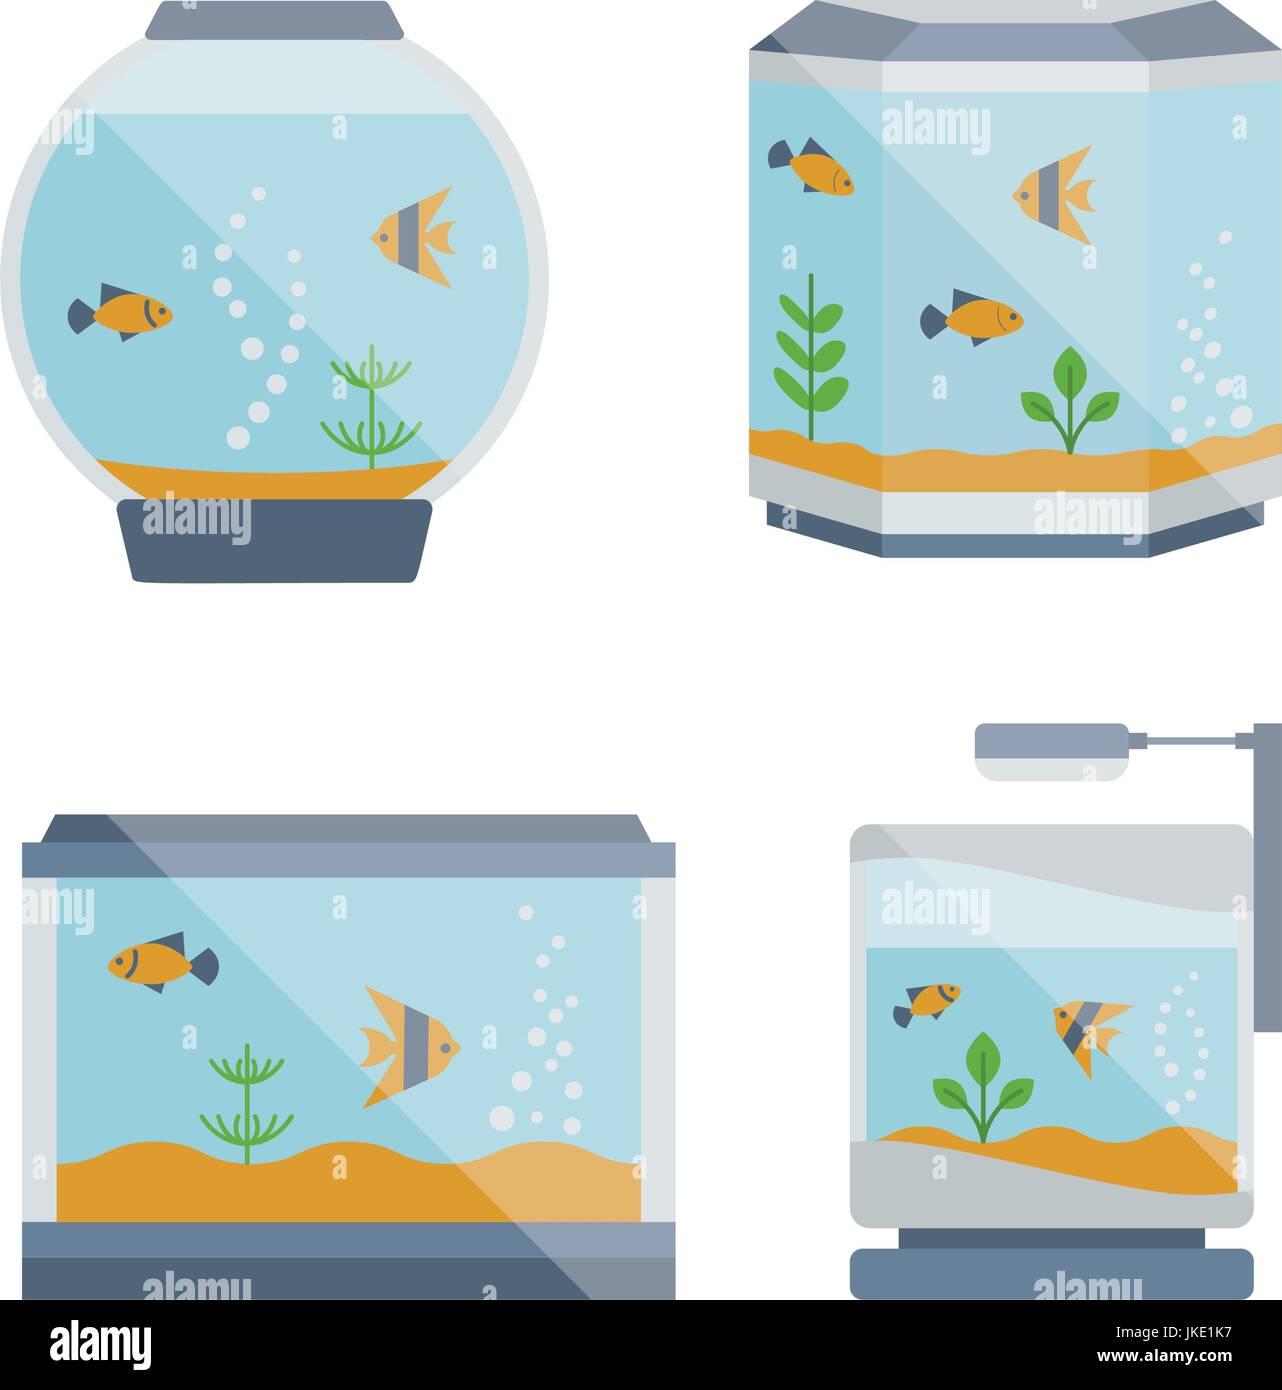 Cartoon vector home aquarium illustration with water, plant. - Stock Image